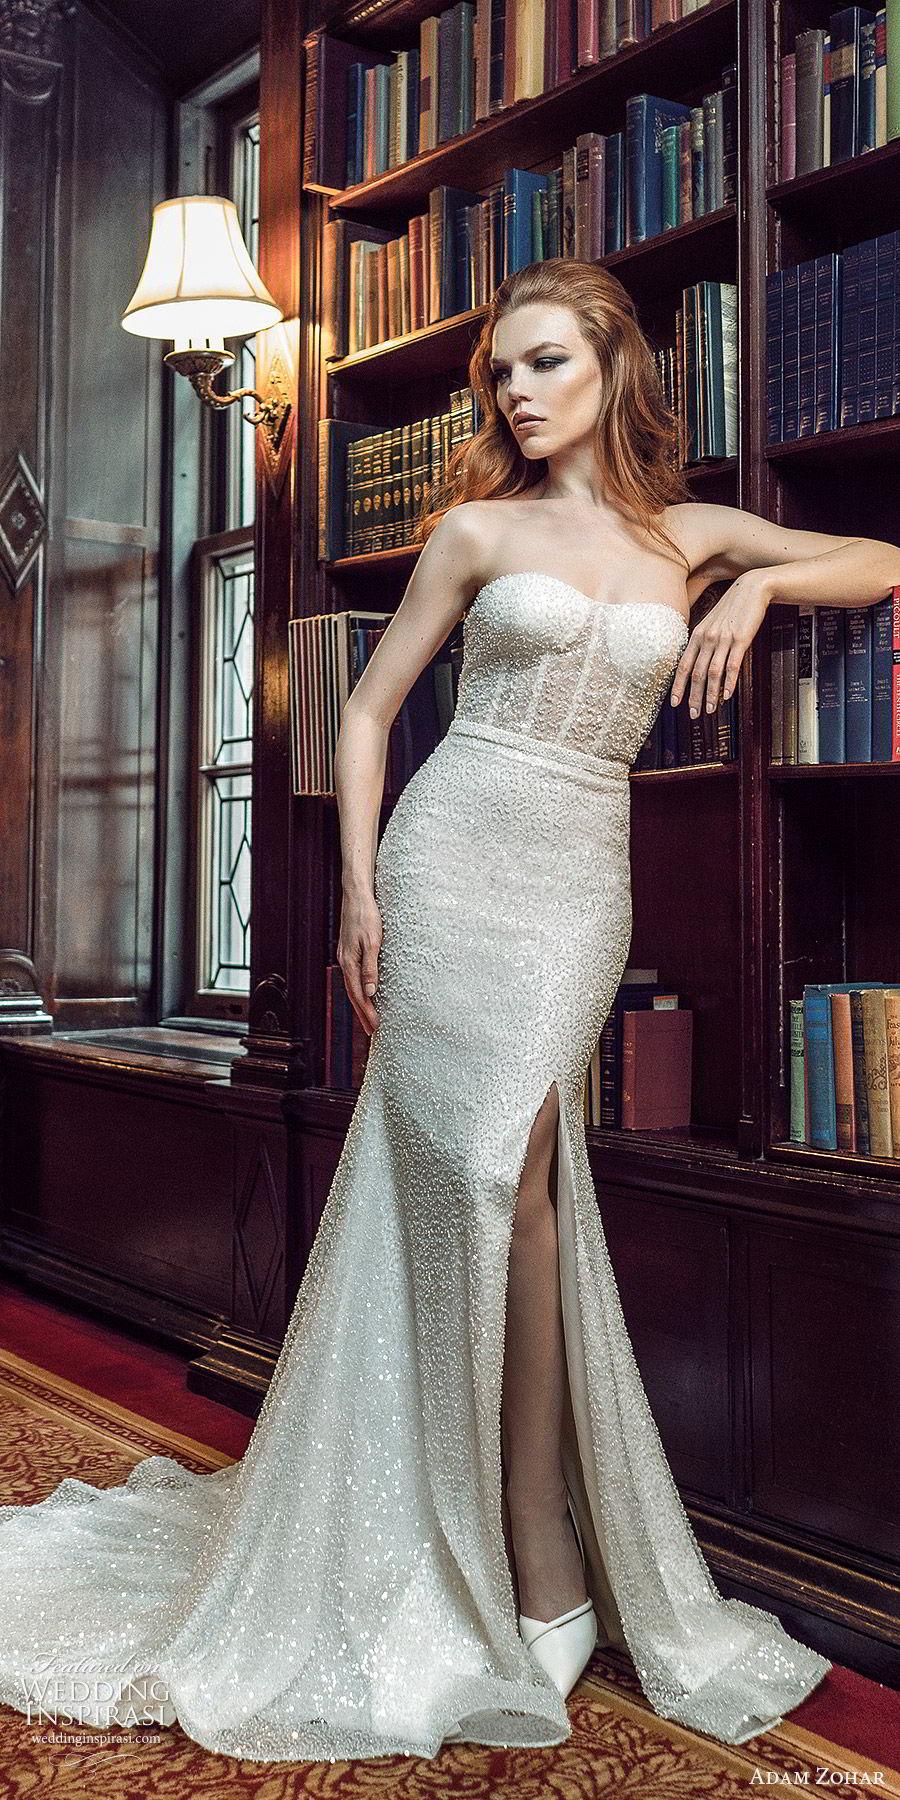 adam zohar 2020 bridal strapless semi sweetheart fully embellished trumpet fit flare mermaid wedding dress (10) glitzy glam slit skirt chapel train mv